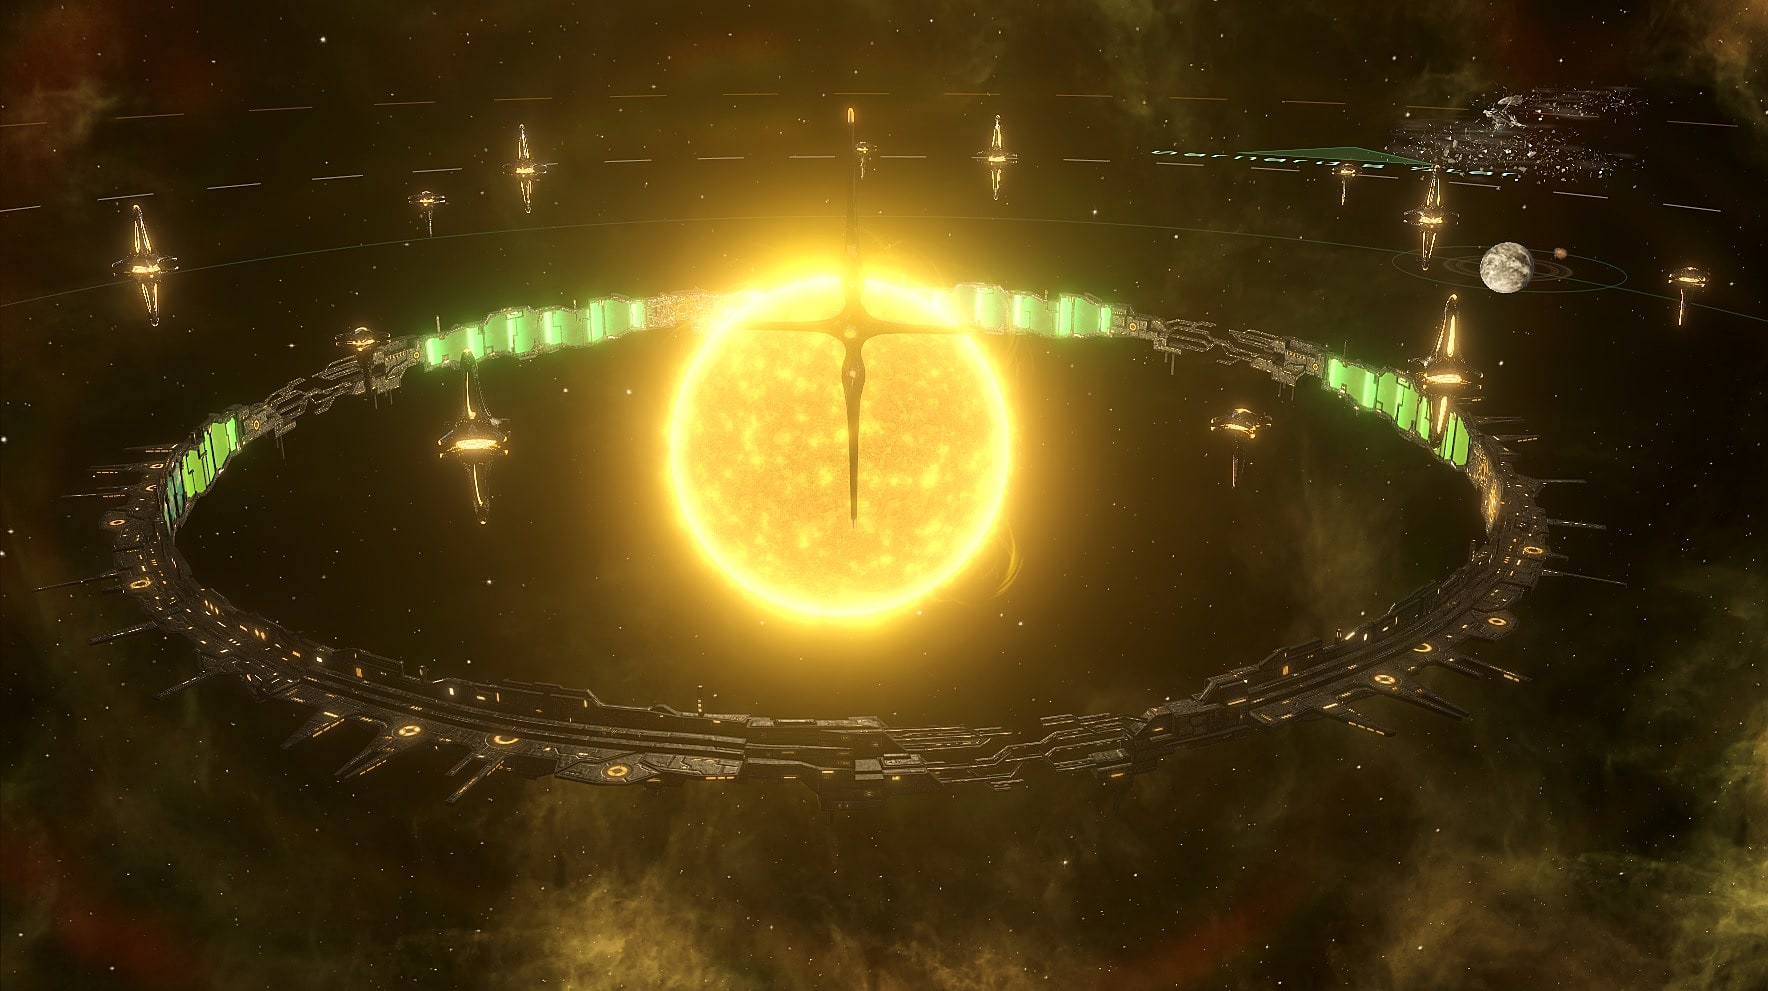 15 Best Stellaris Mods to Maximize Your Gameplay | Slide 4 | Stellaris